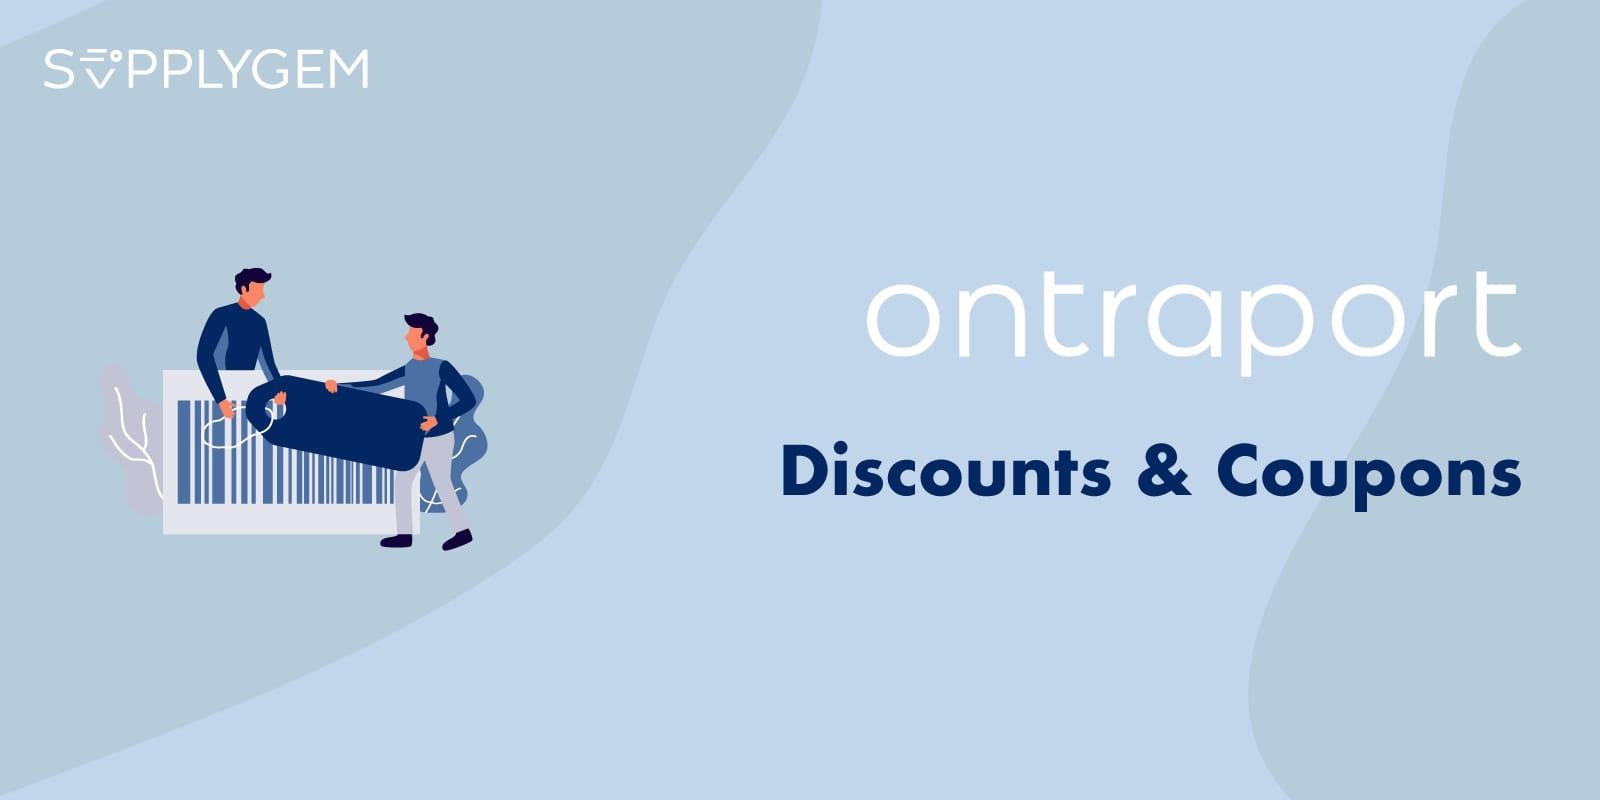 Ontraport Discounts